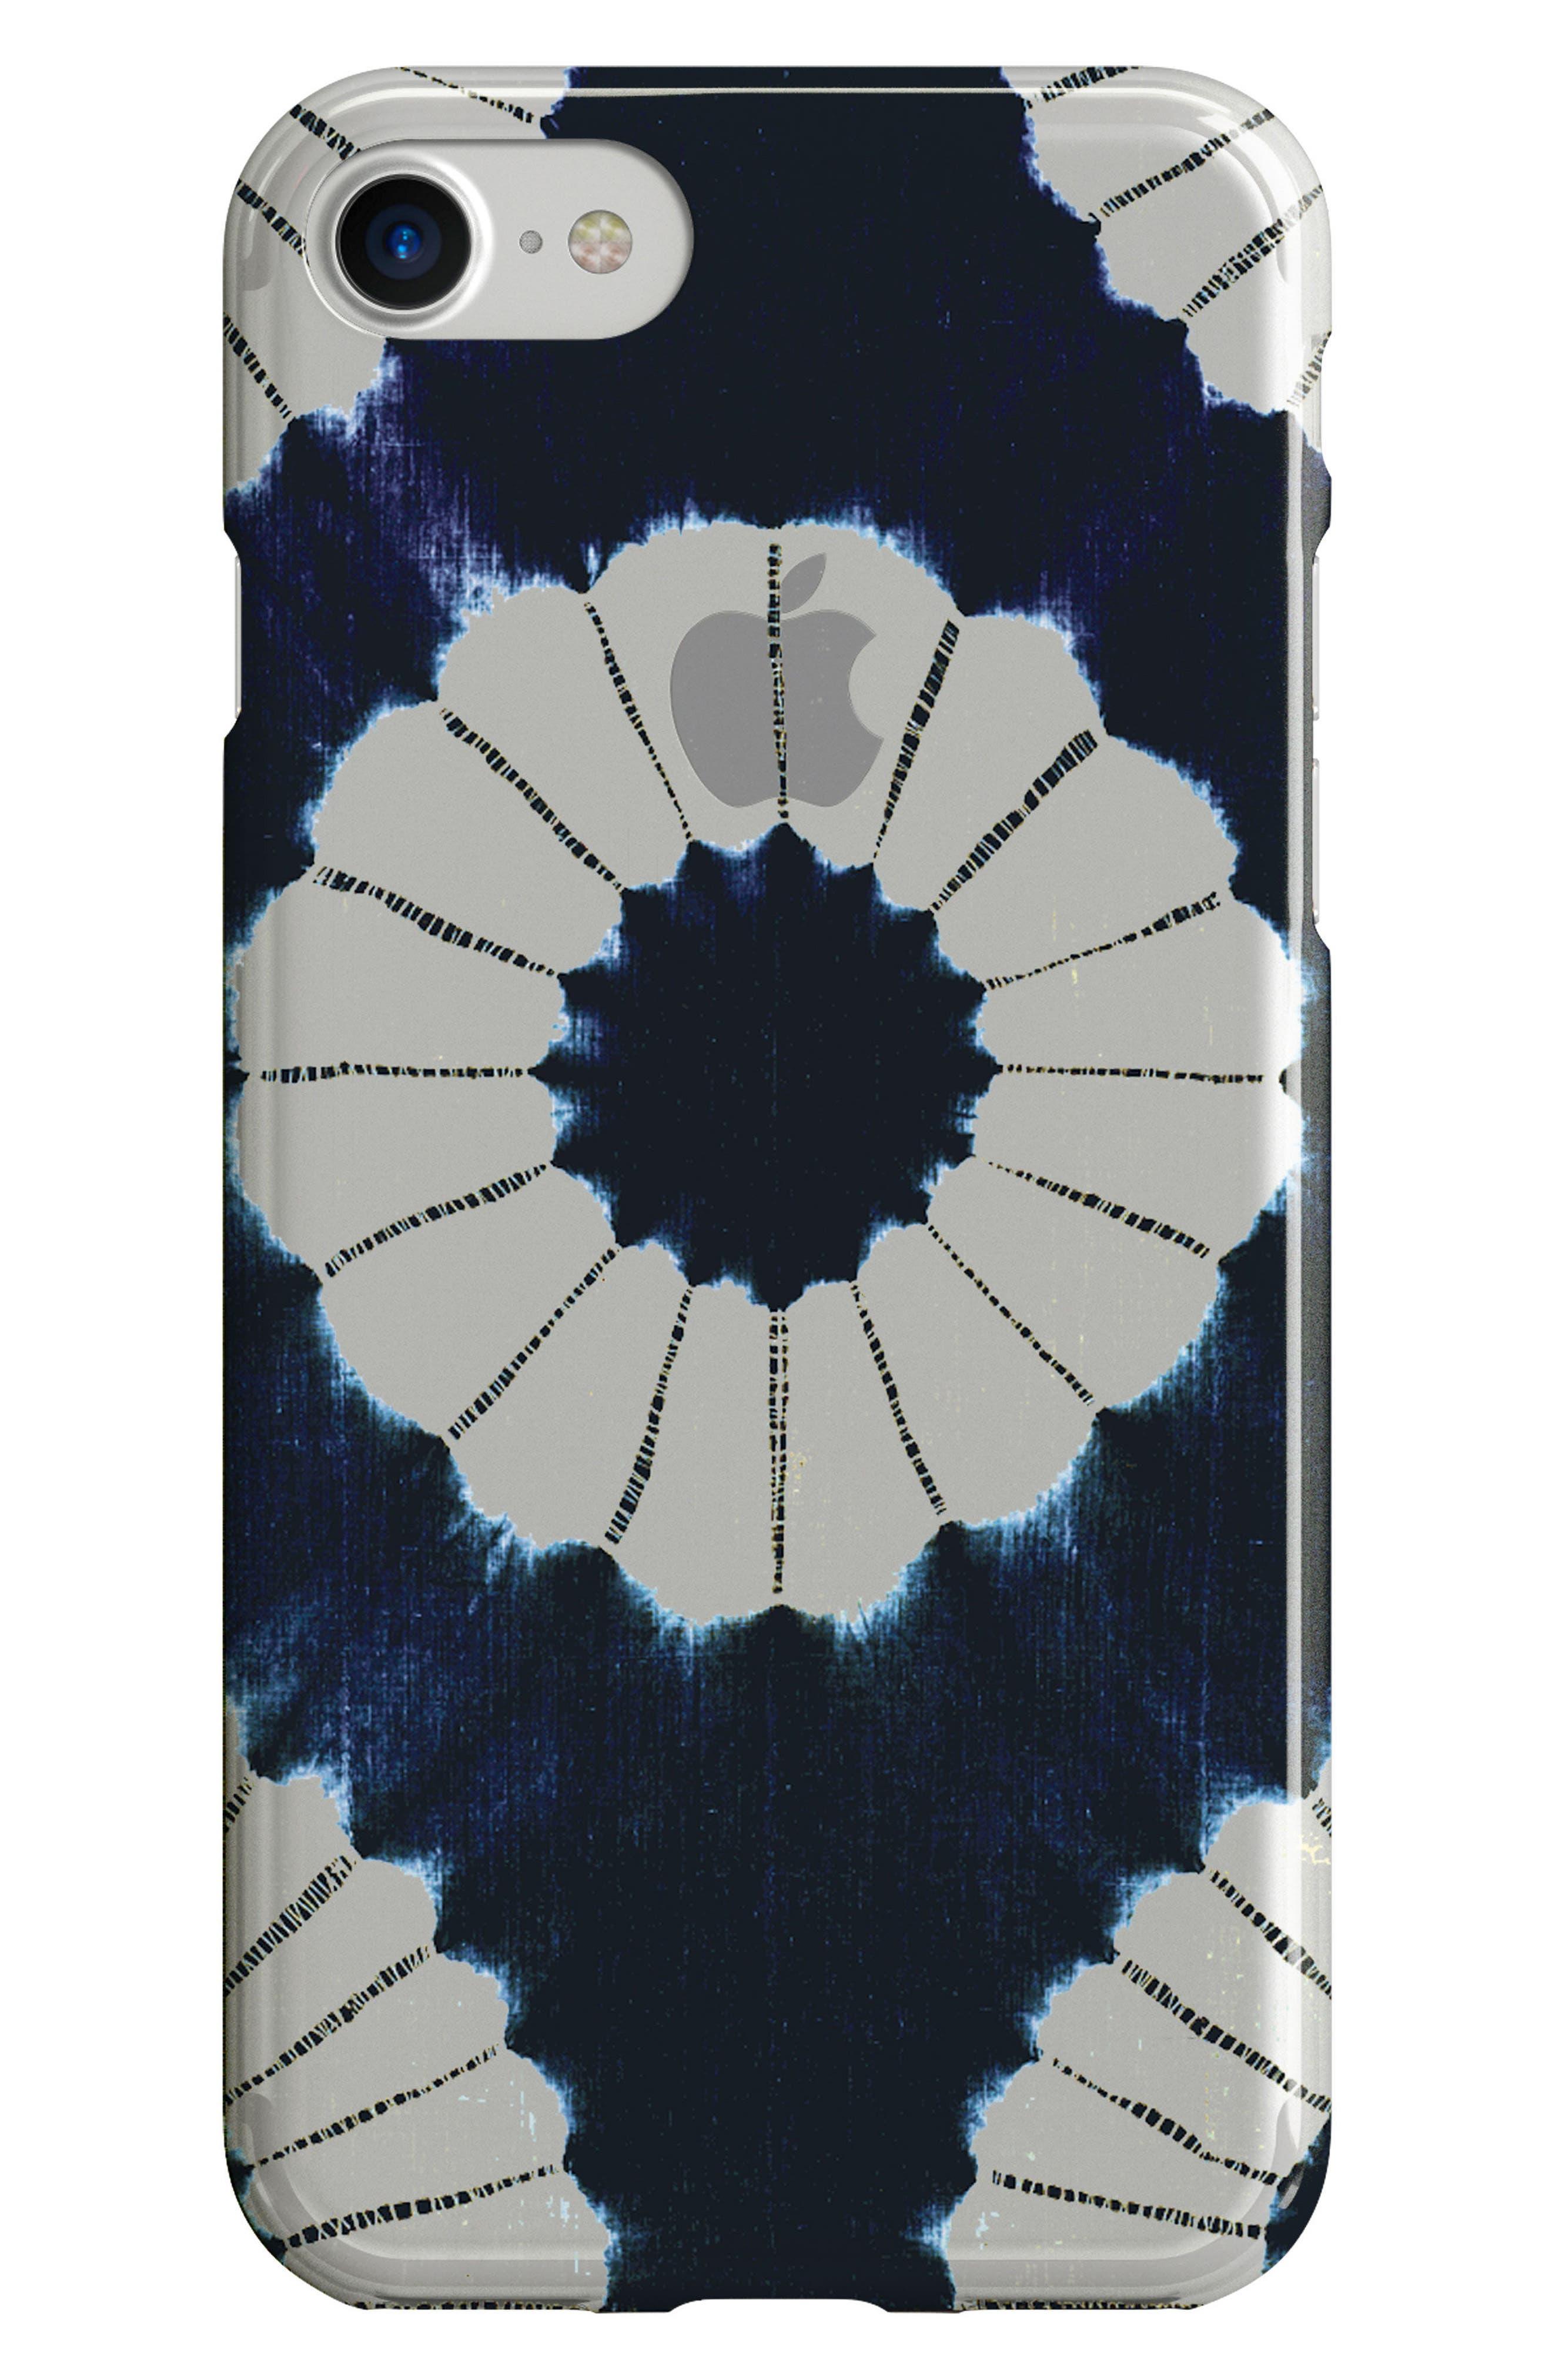 Main Image - Recover Indigo iPhone 6/6s/7/8 Case